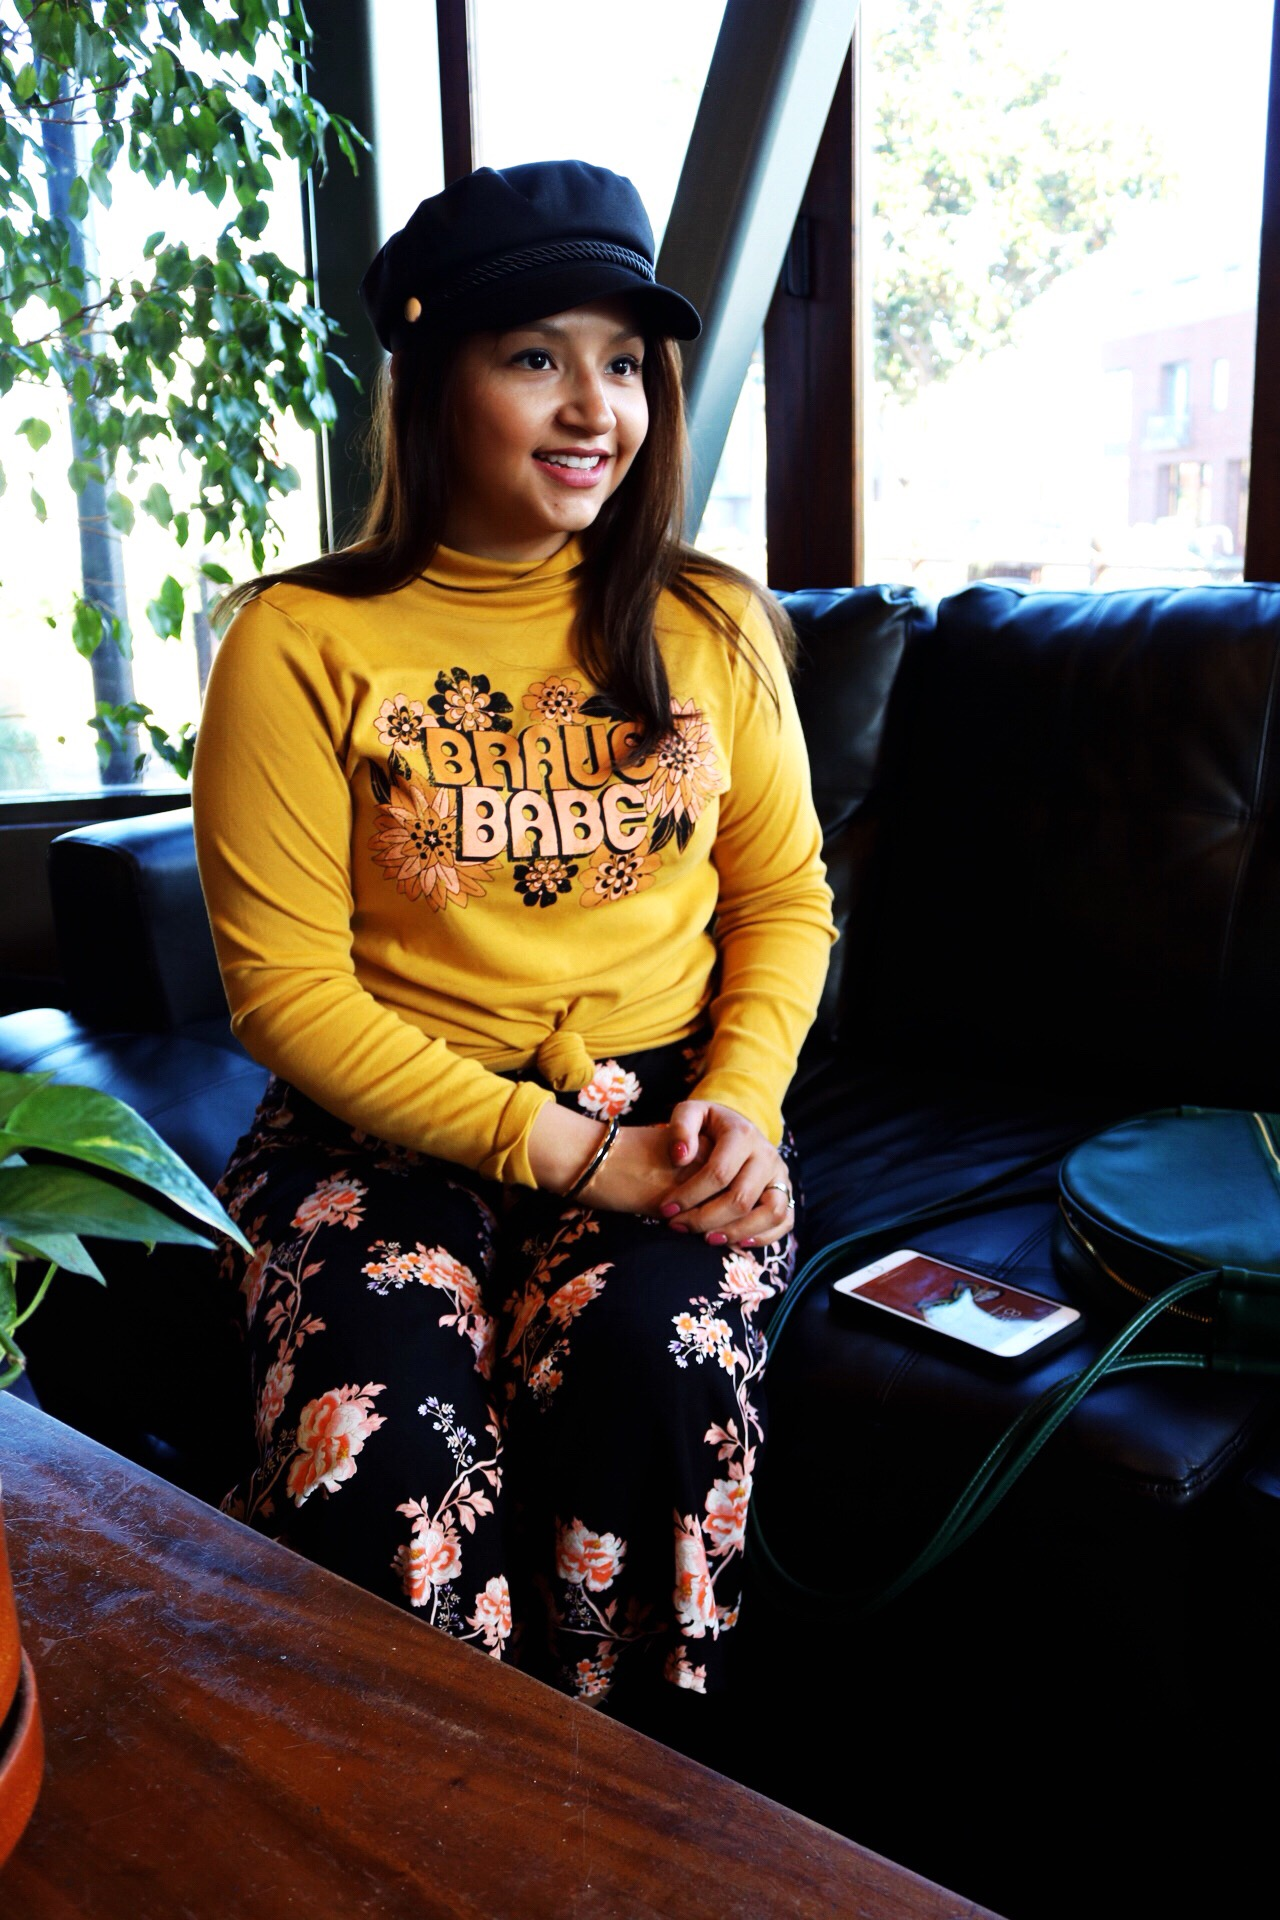 Dazey_LA feminist t-shirt Brace Babe t-shirt camel wide brim fedora Black and gold Ban.do BFF bag Yellow bug Floral pants coffee house